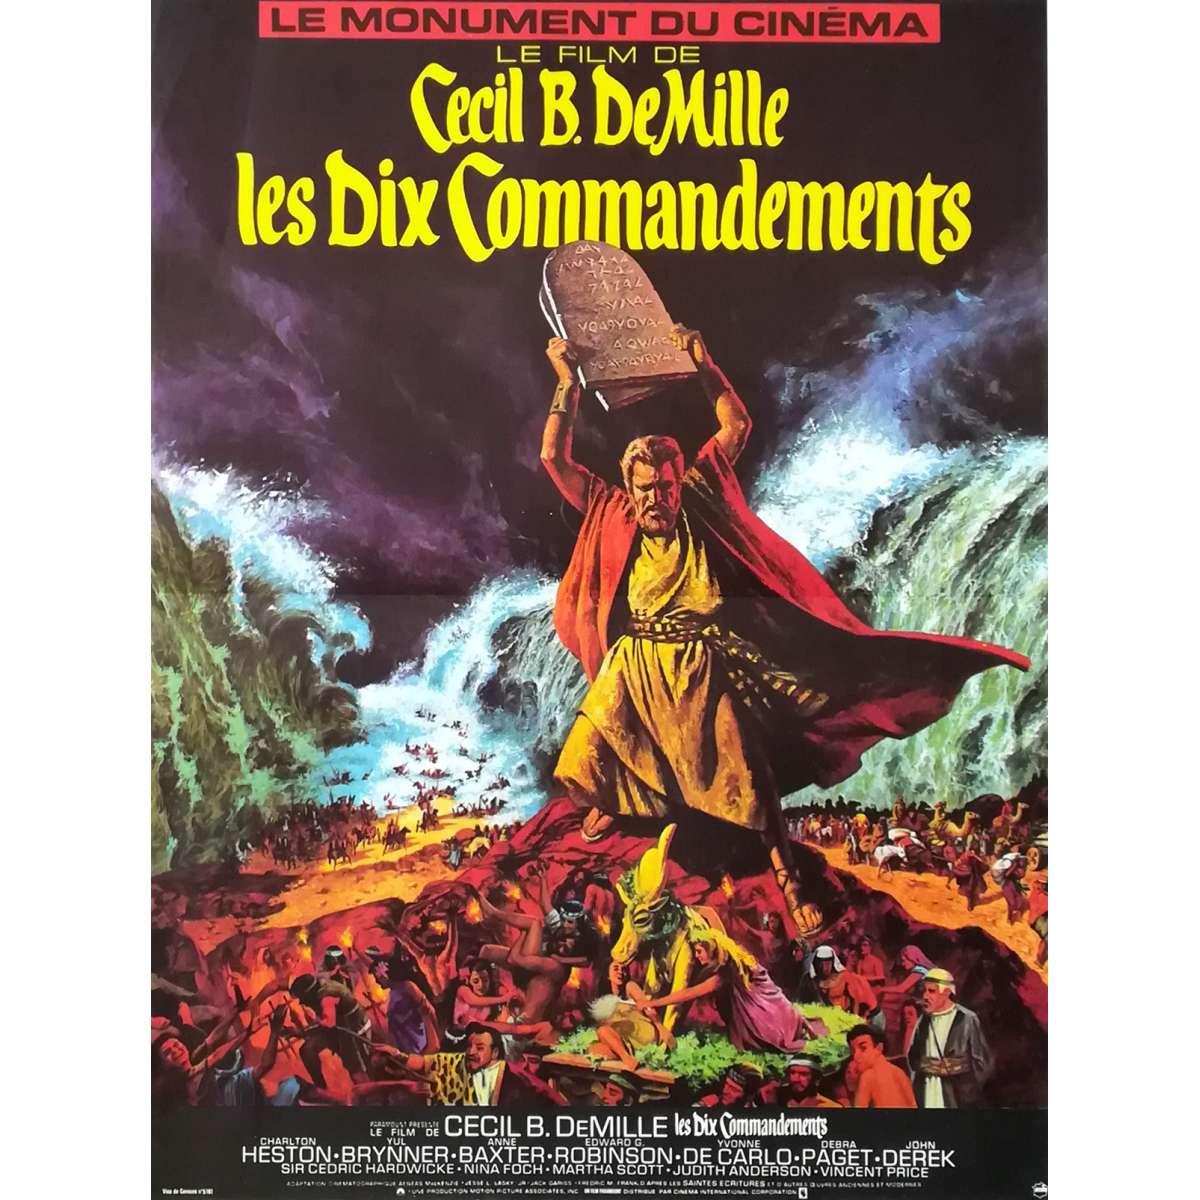 the ten commandments original movie poster 15x21 in 1956 r1970 cecil b demille charlton heston